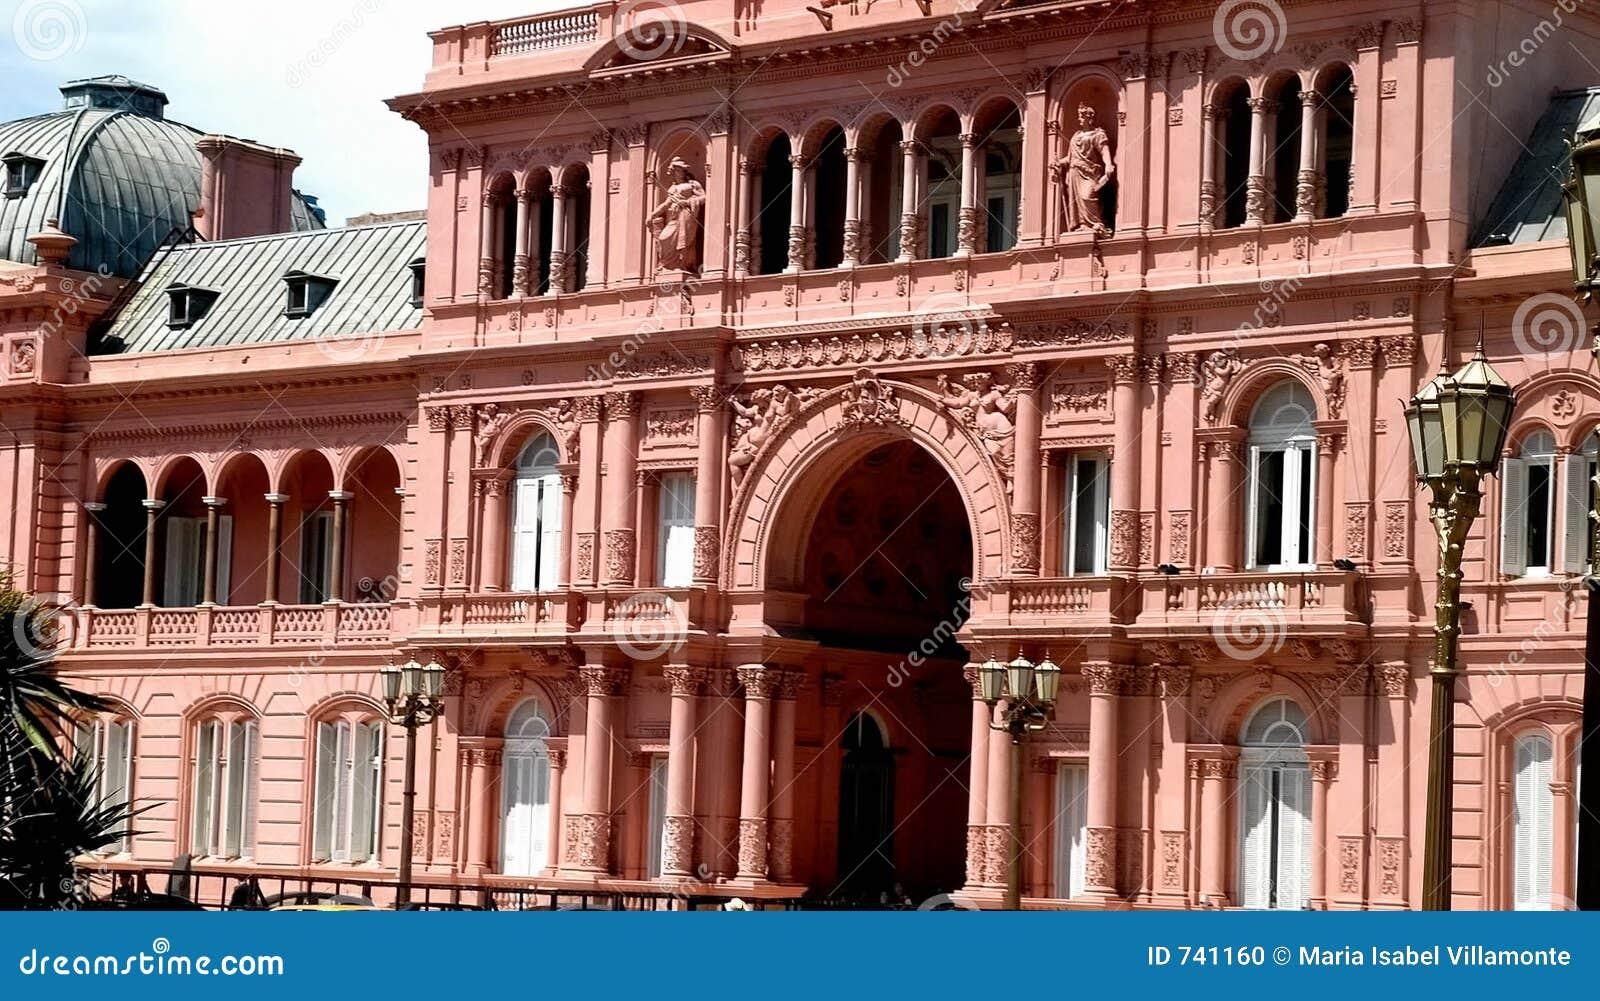 Casa rosada argentina stock photo image 741160 for Casa argentina